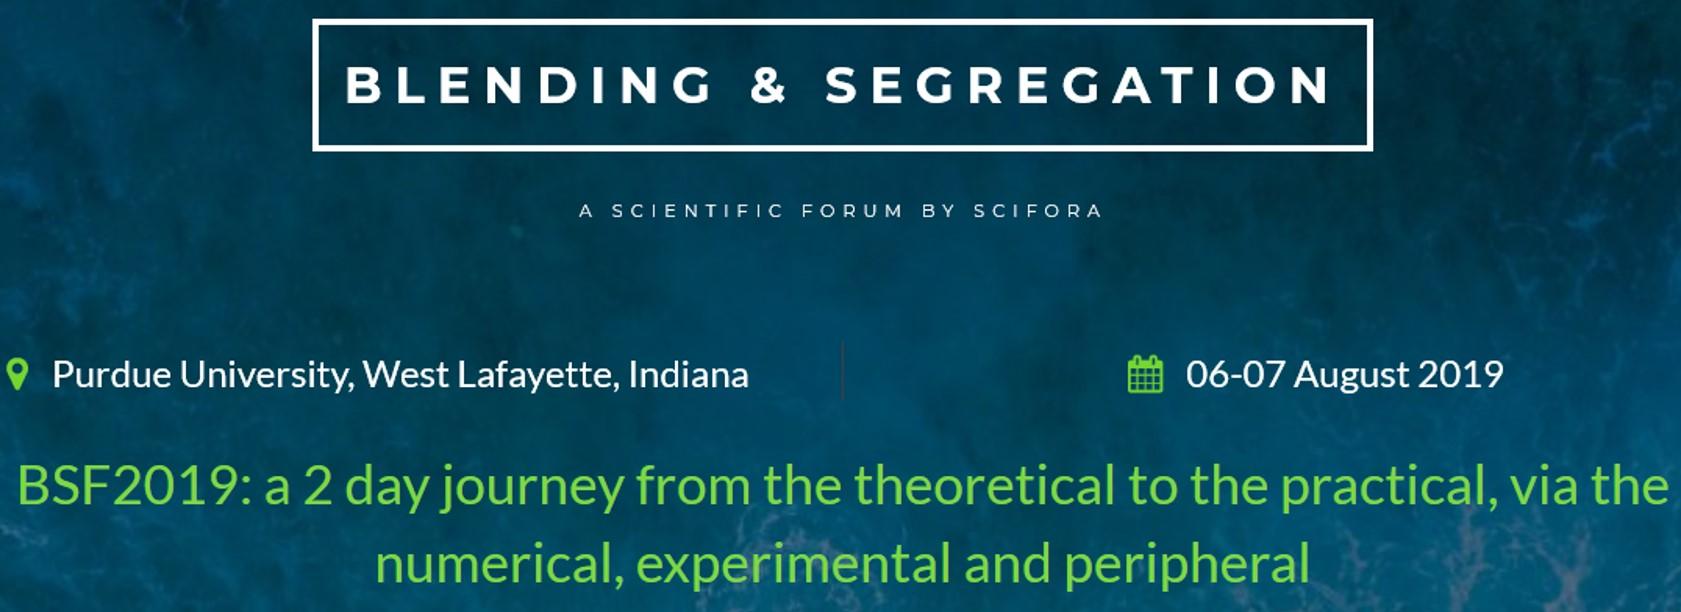 Blending & Segregation Forum